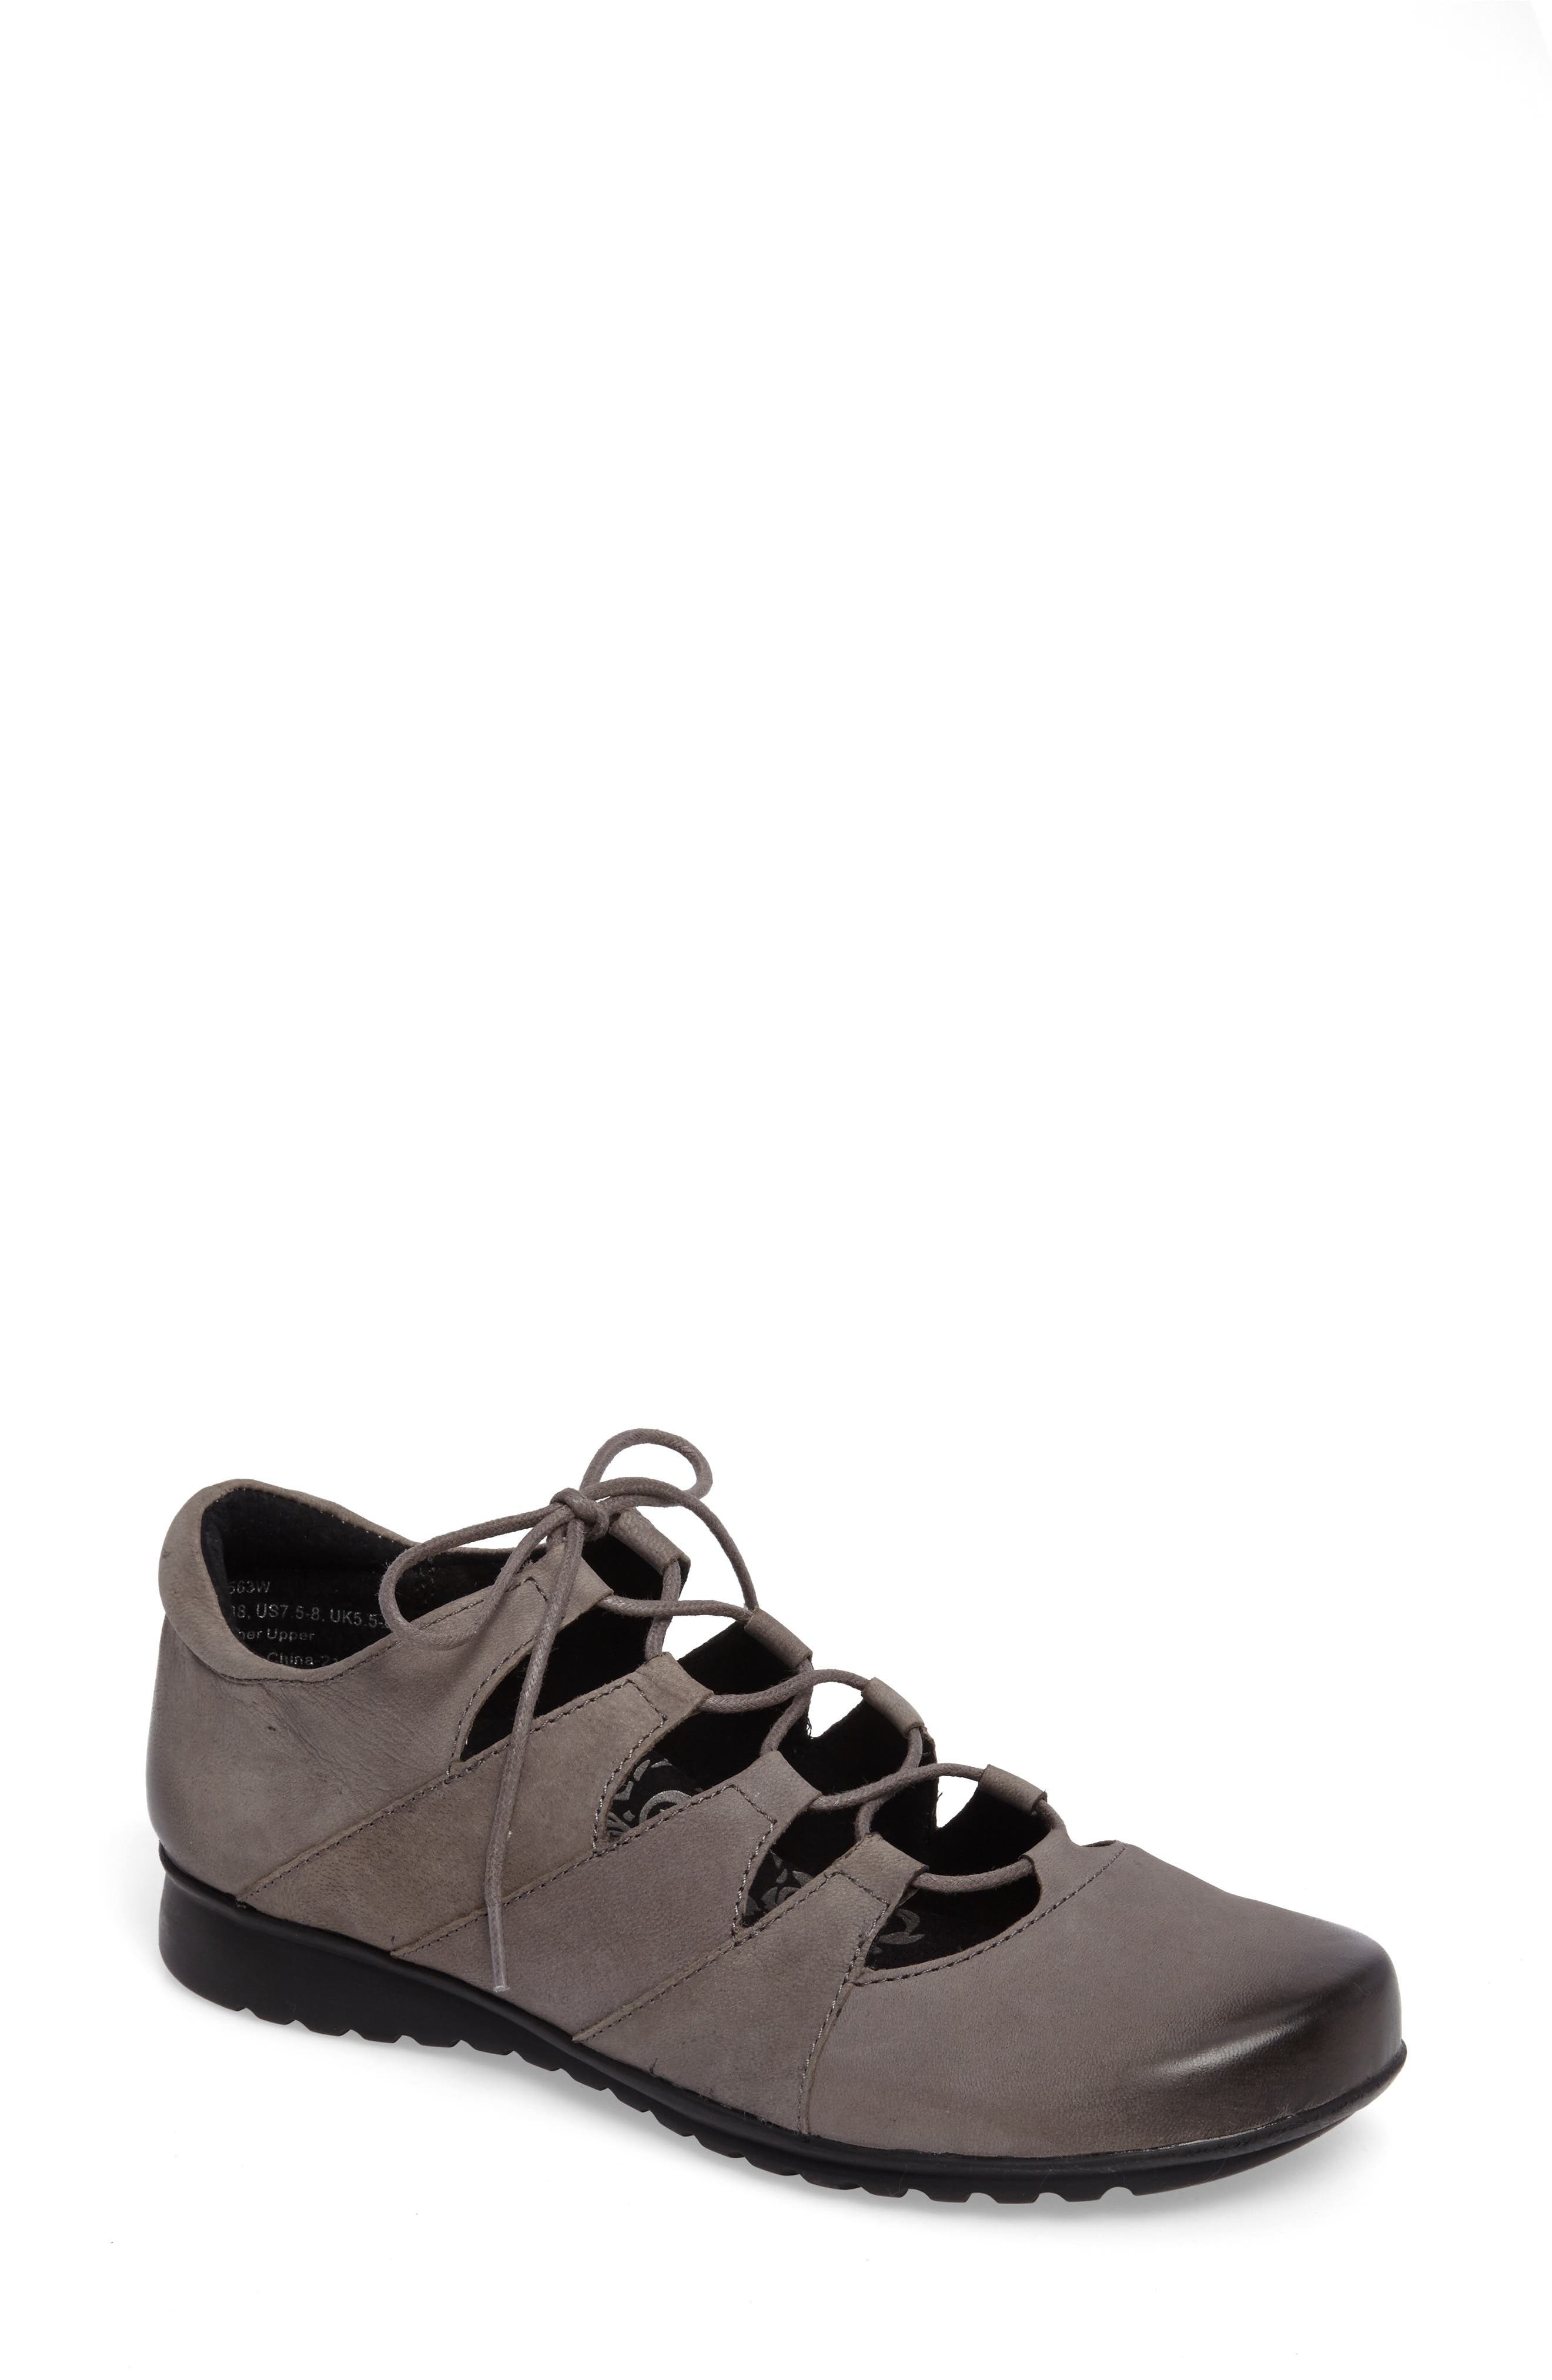 Aetrex Sienna Cutout Sneaker, Grey